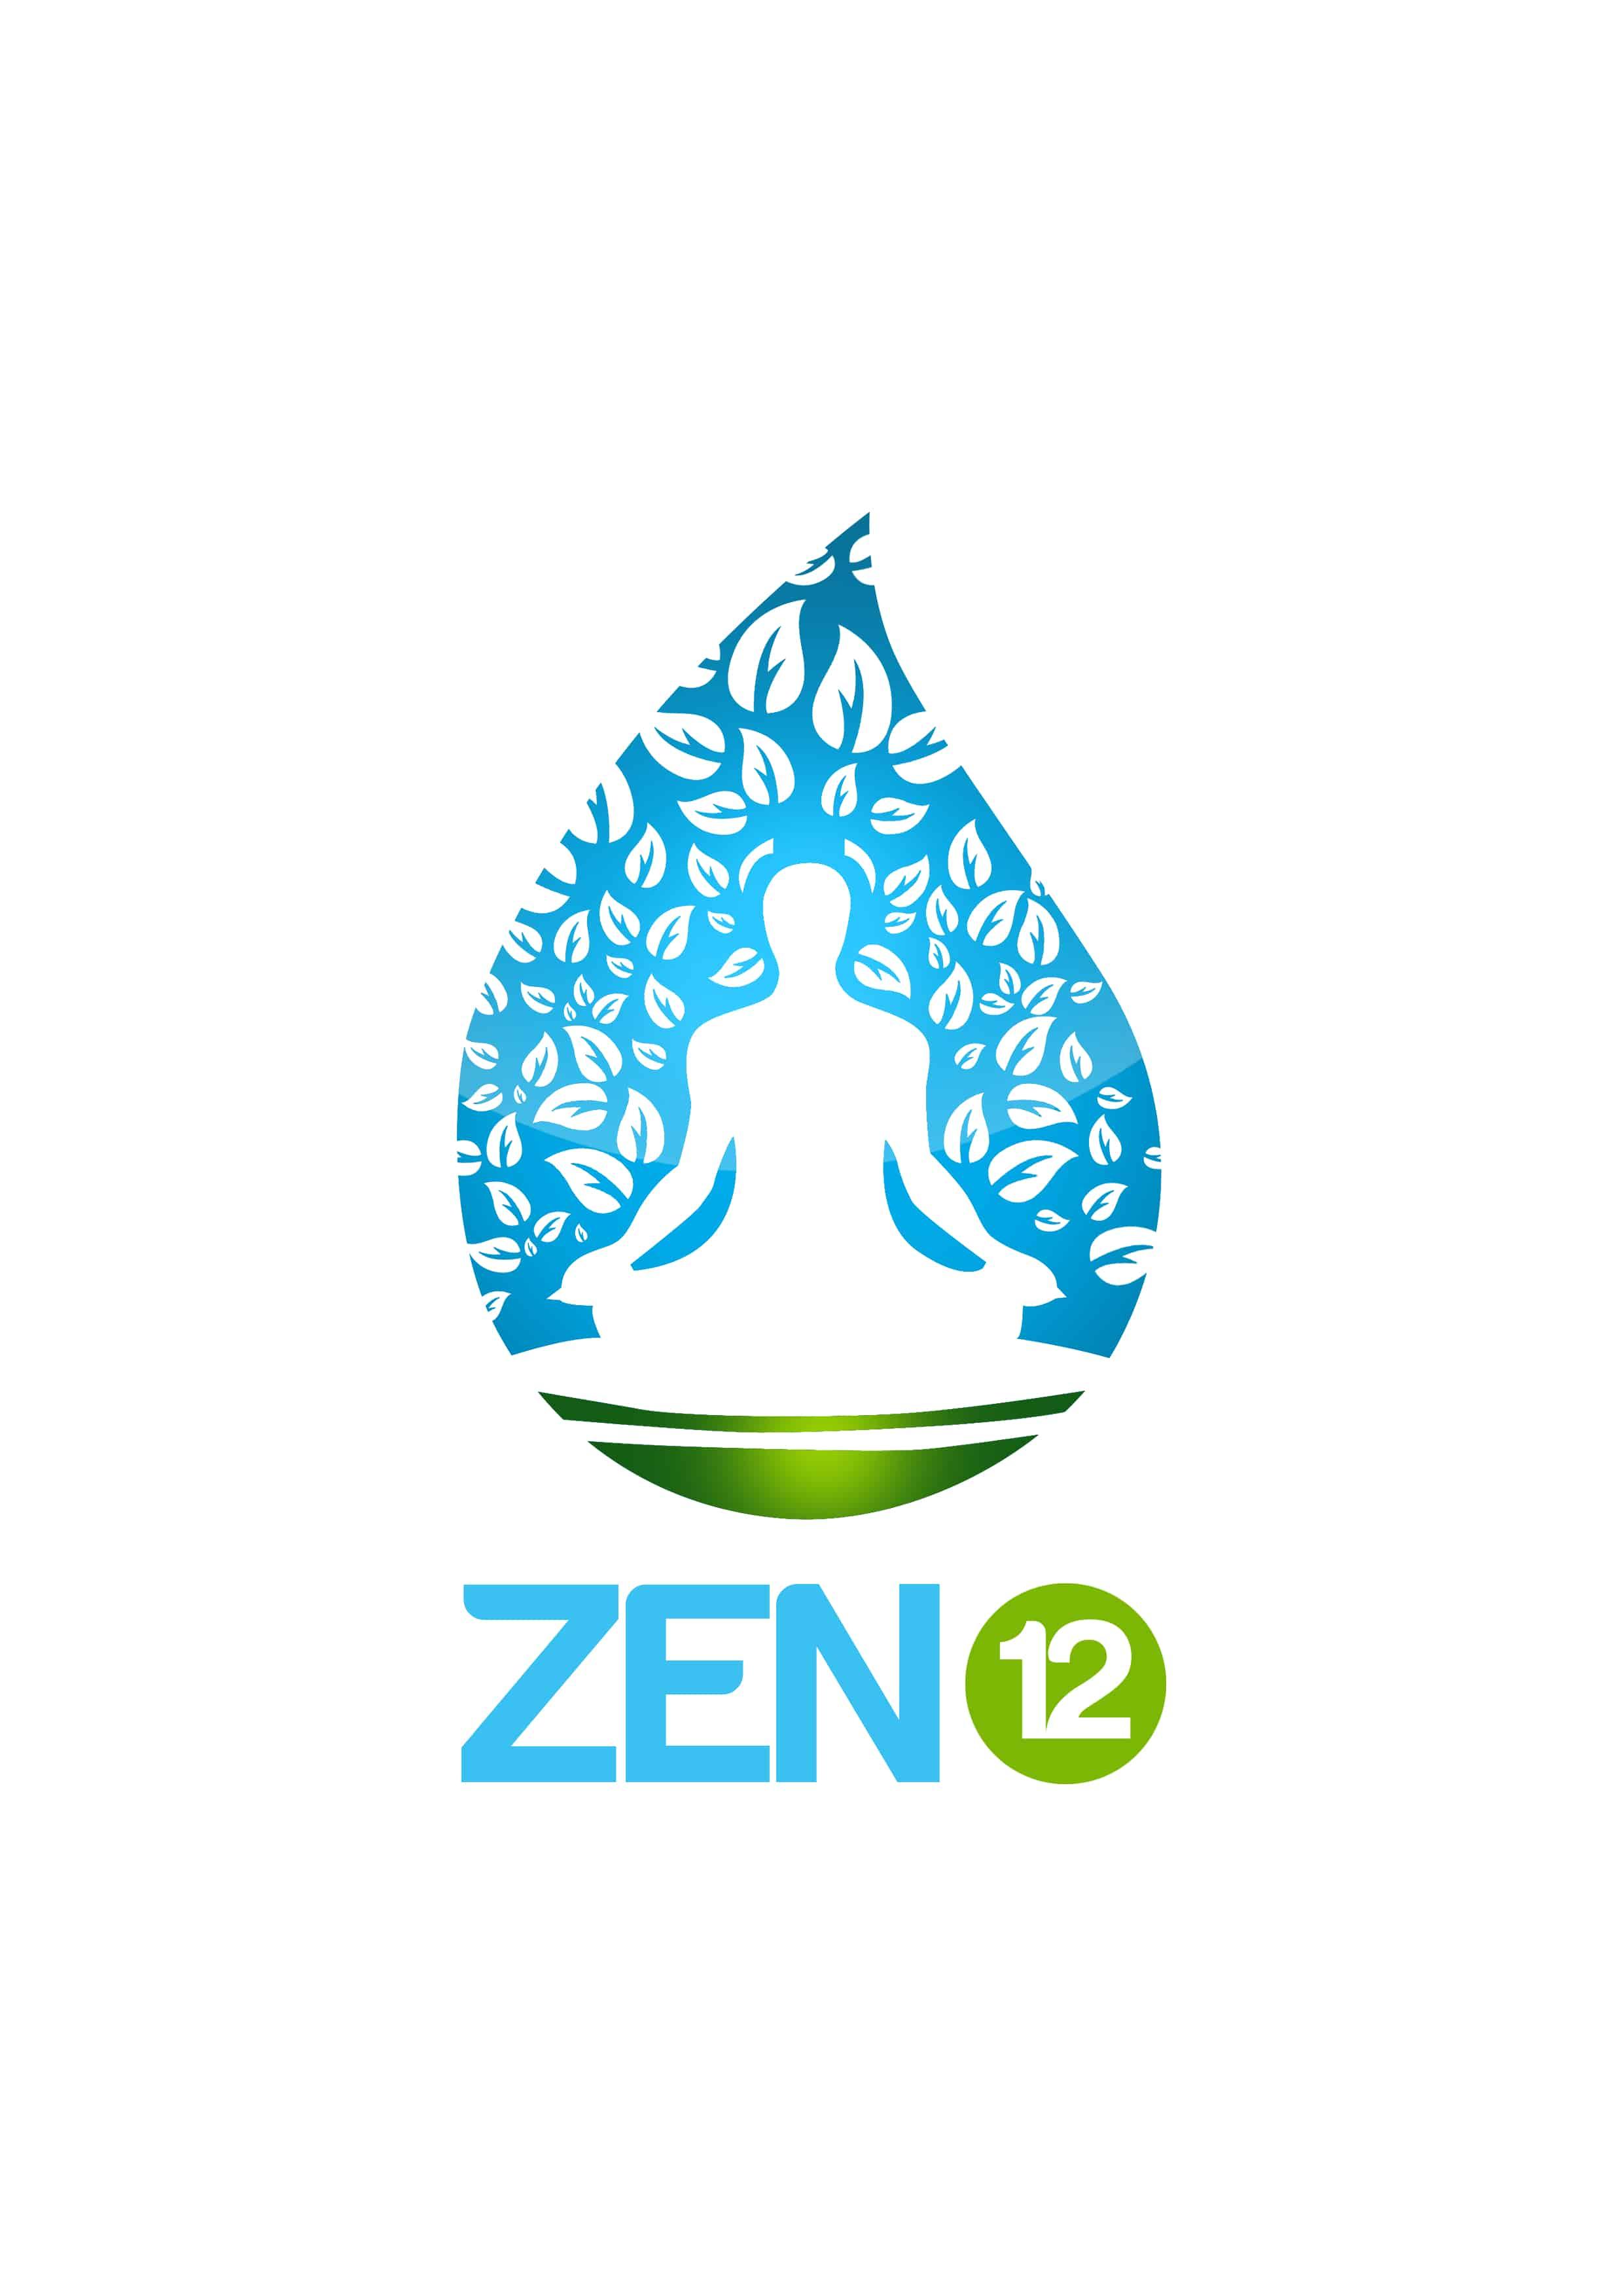 Zen12 Meditation Review